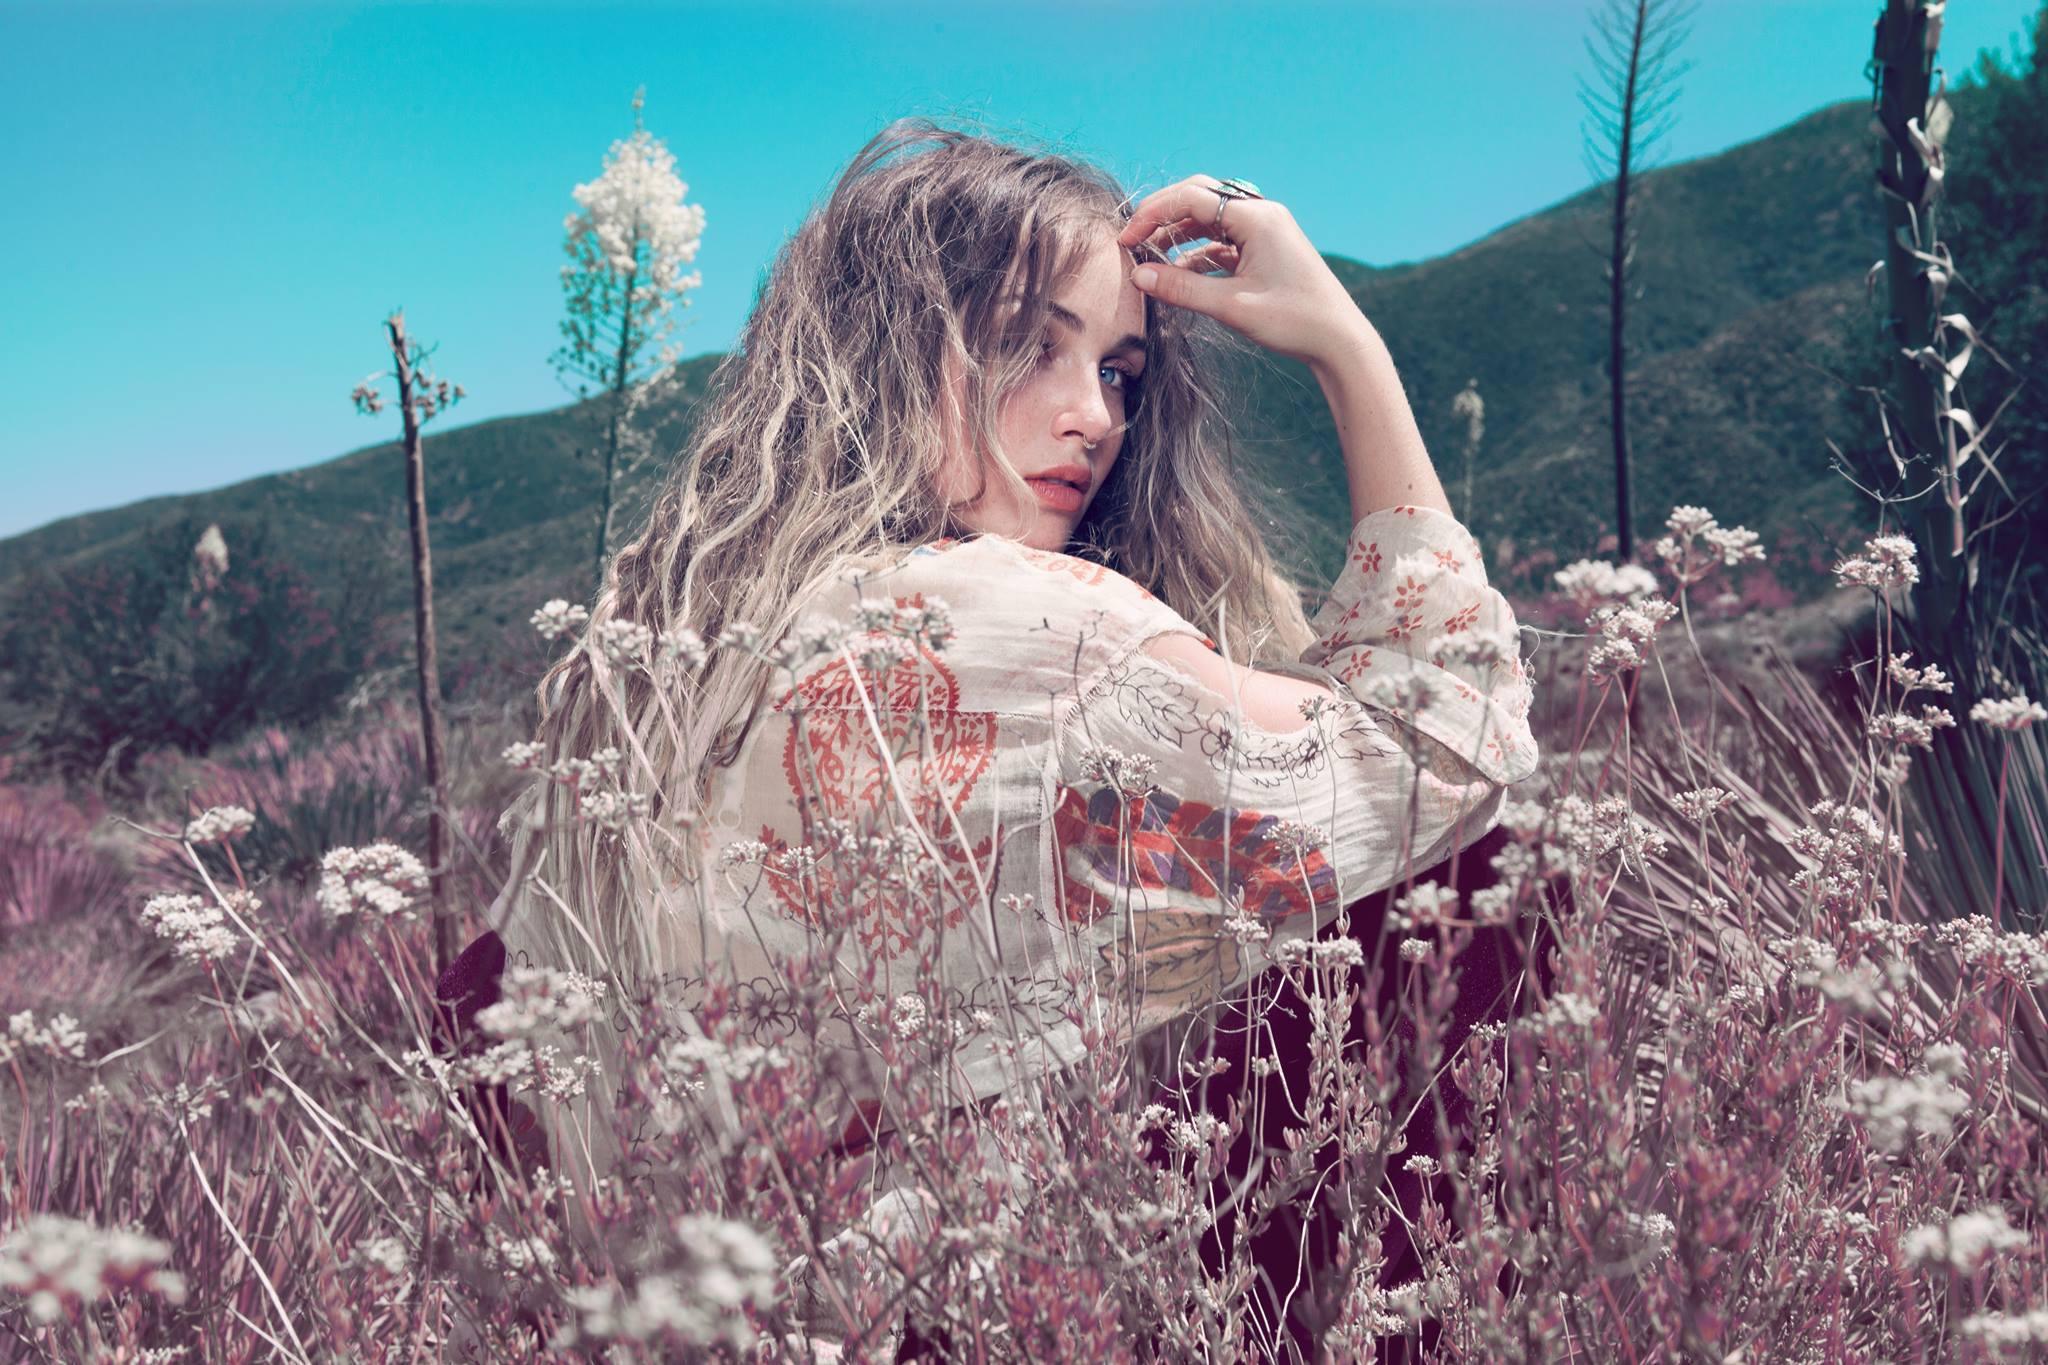 photography Janell Shirtcliff - Zella Day